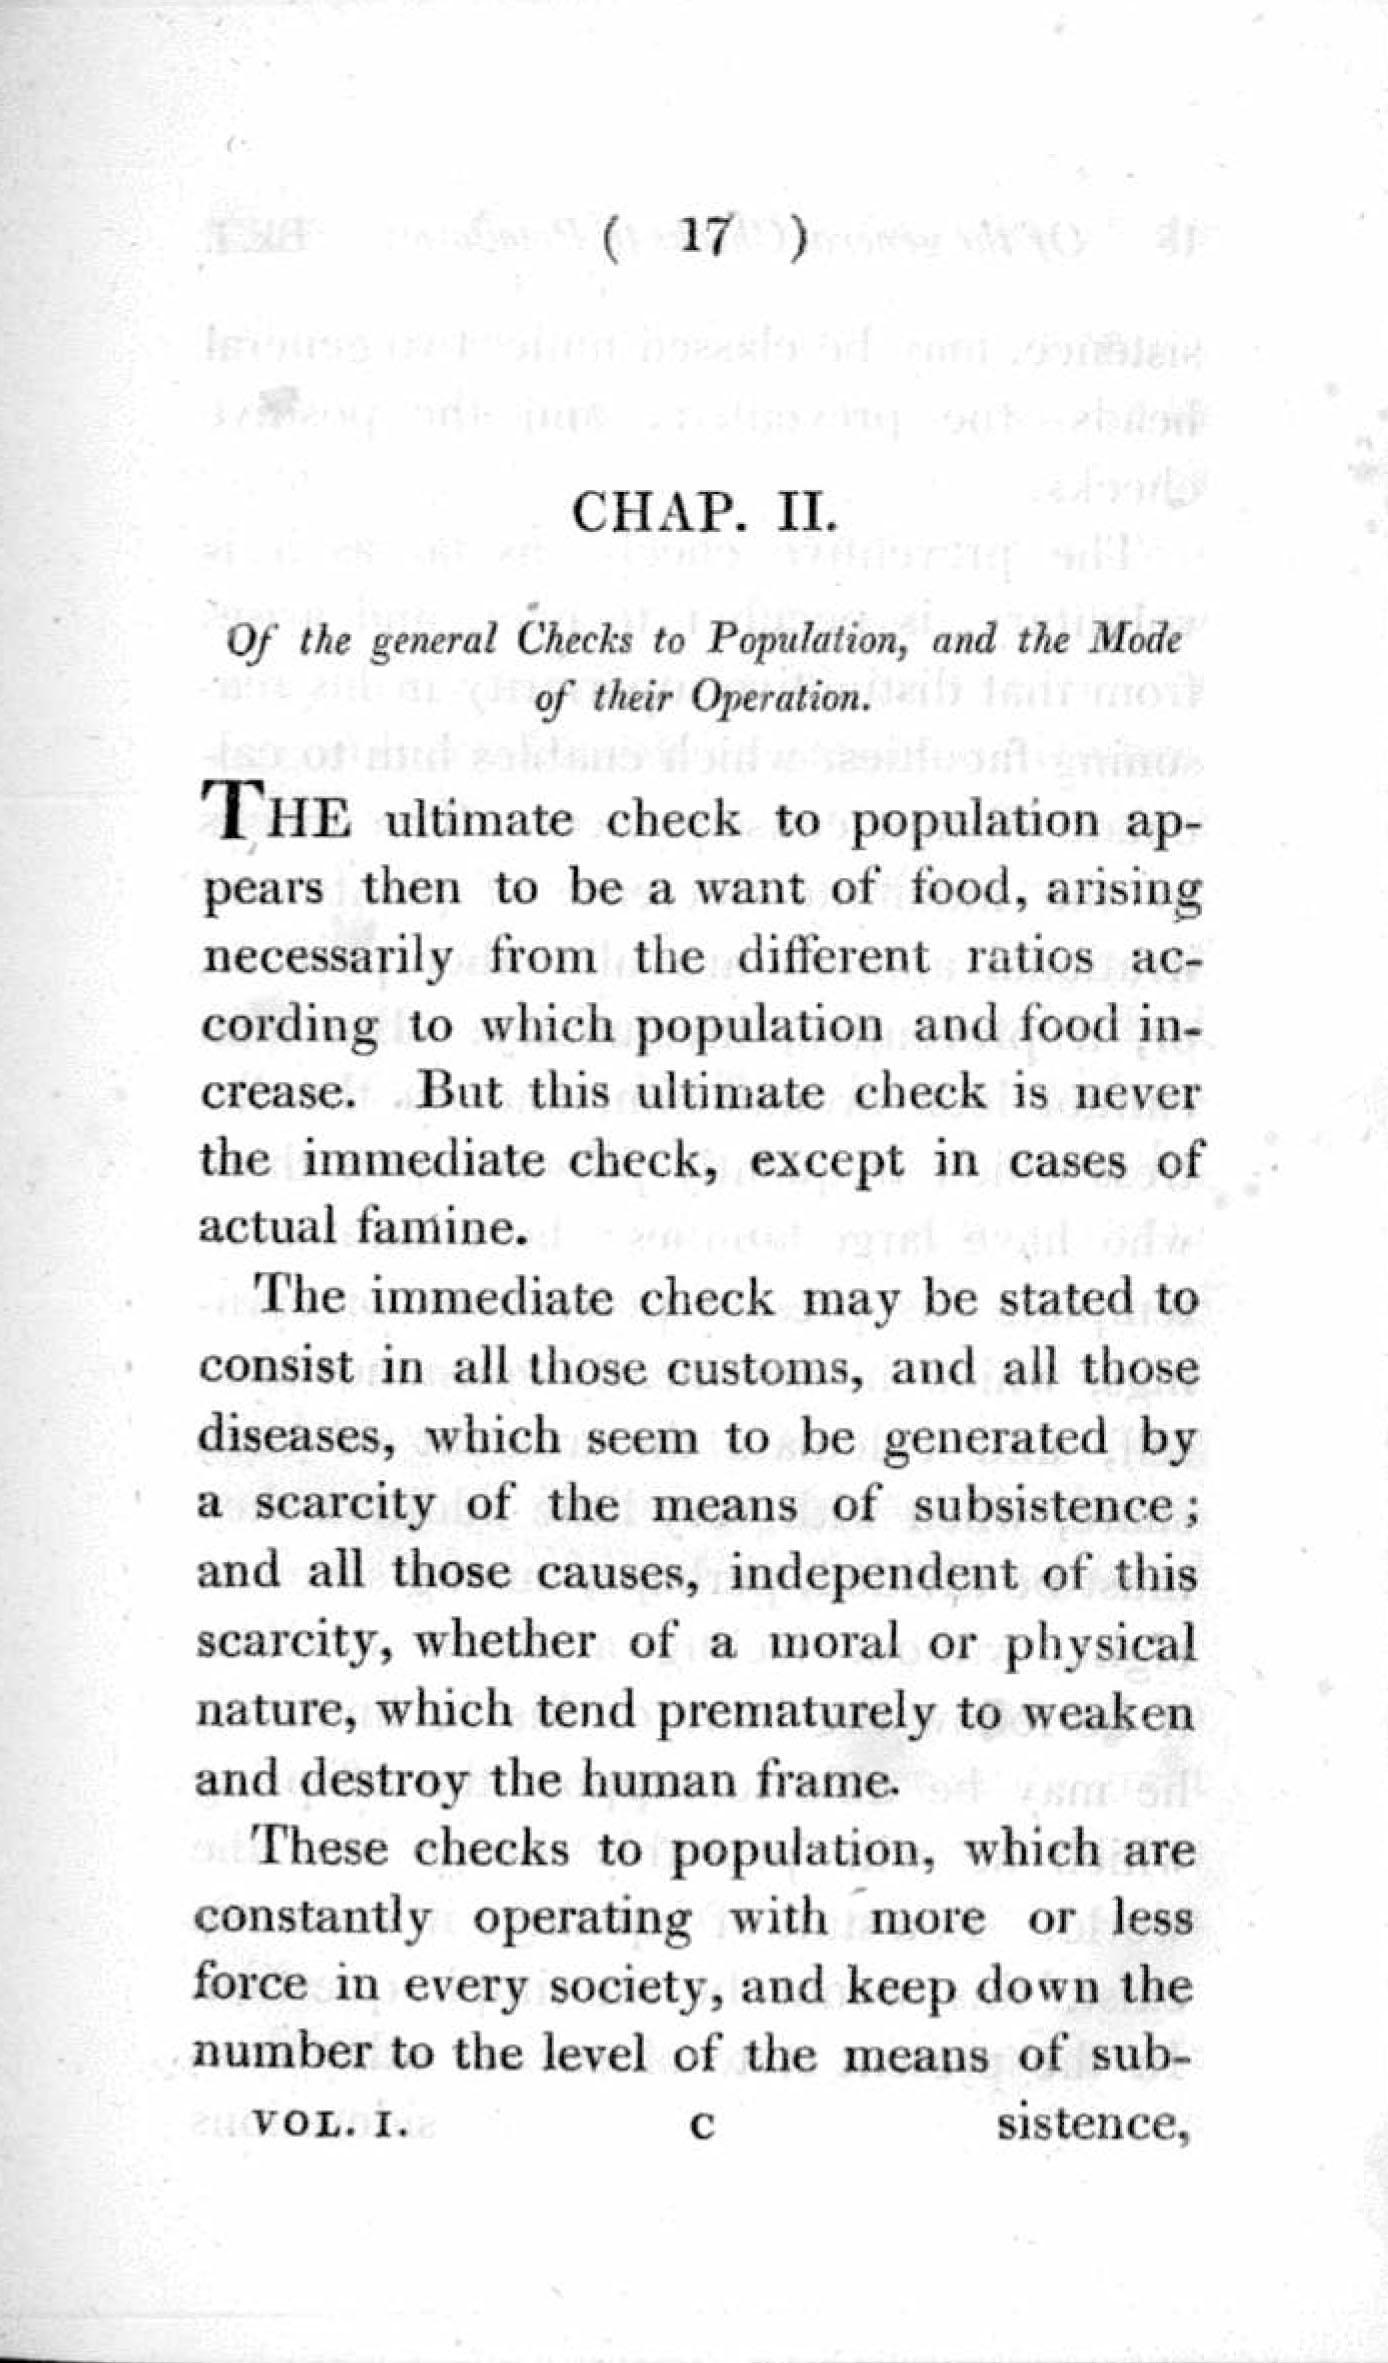 012 Essay Example On The Principle Of Singular Population Pdf By Thomas Malthus Main Idea Full